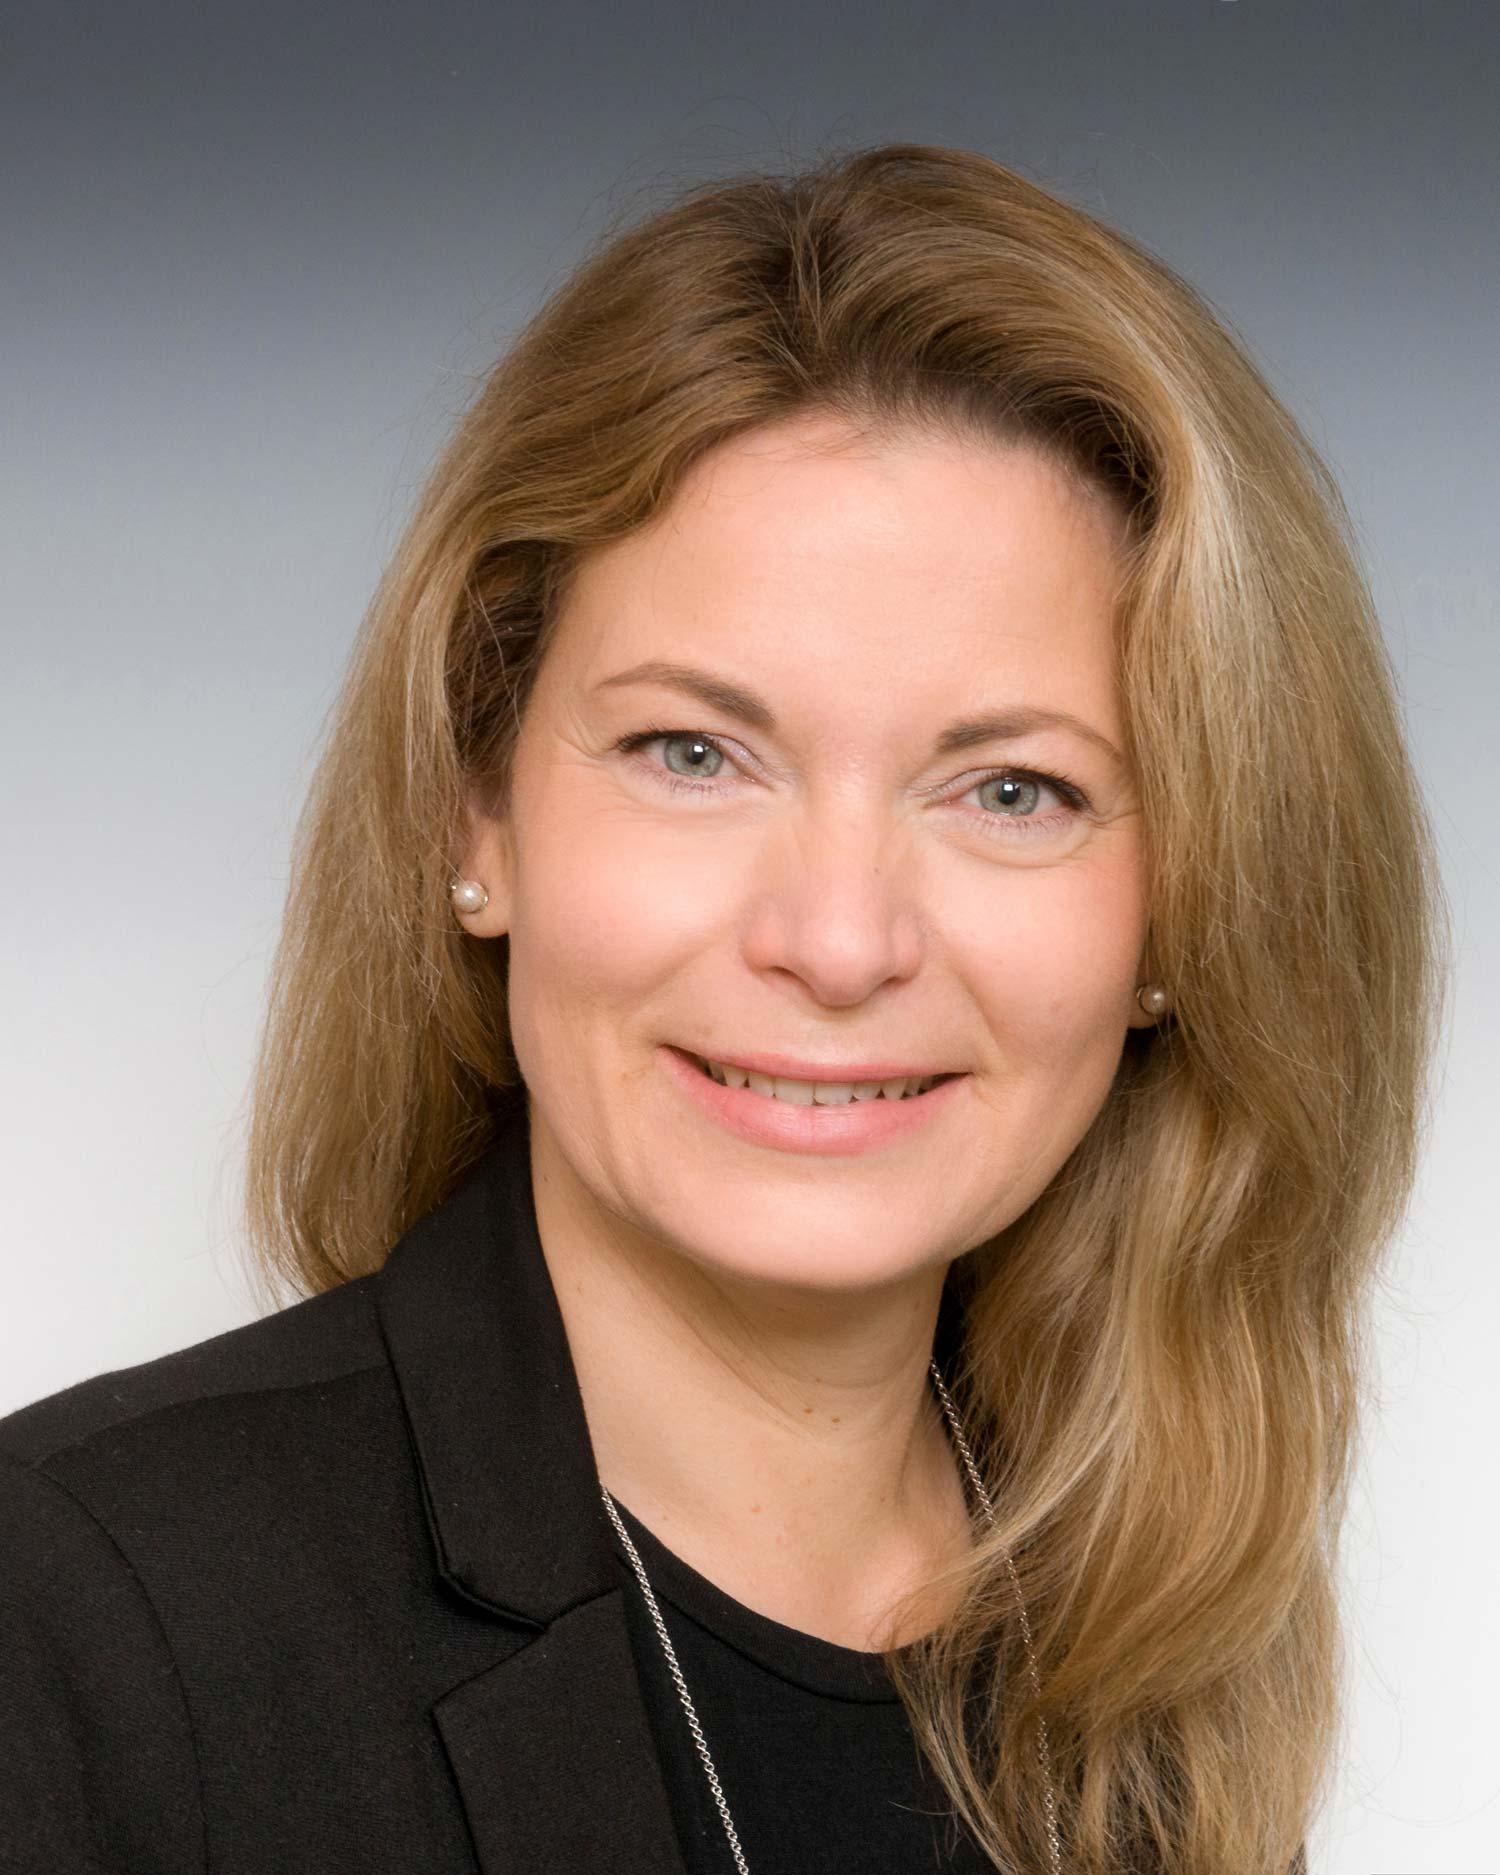 Kristin Staufenbiel